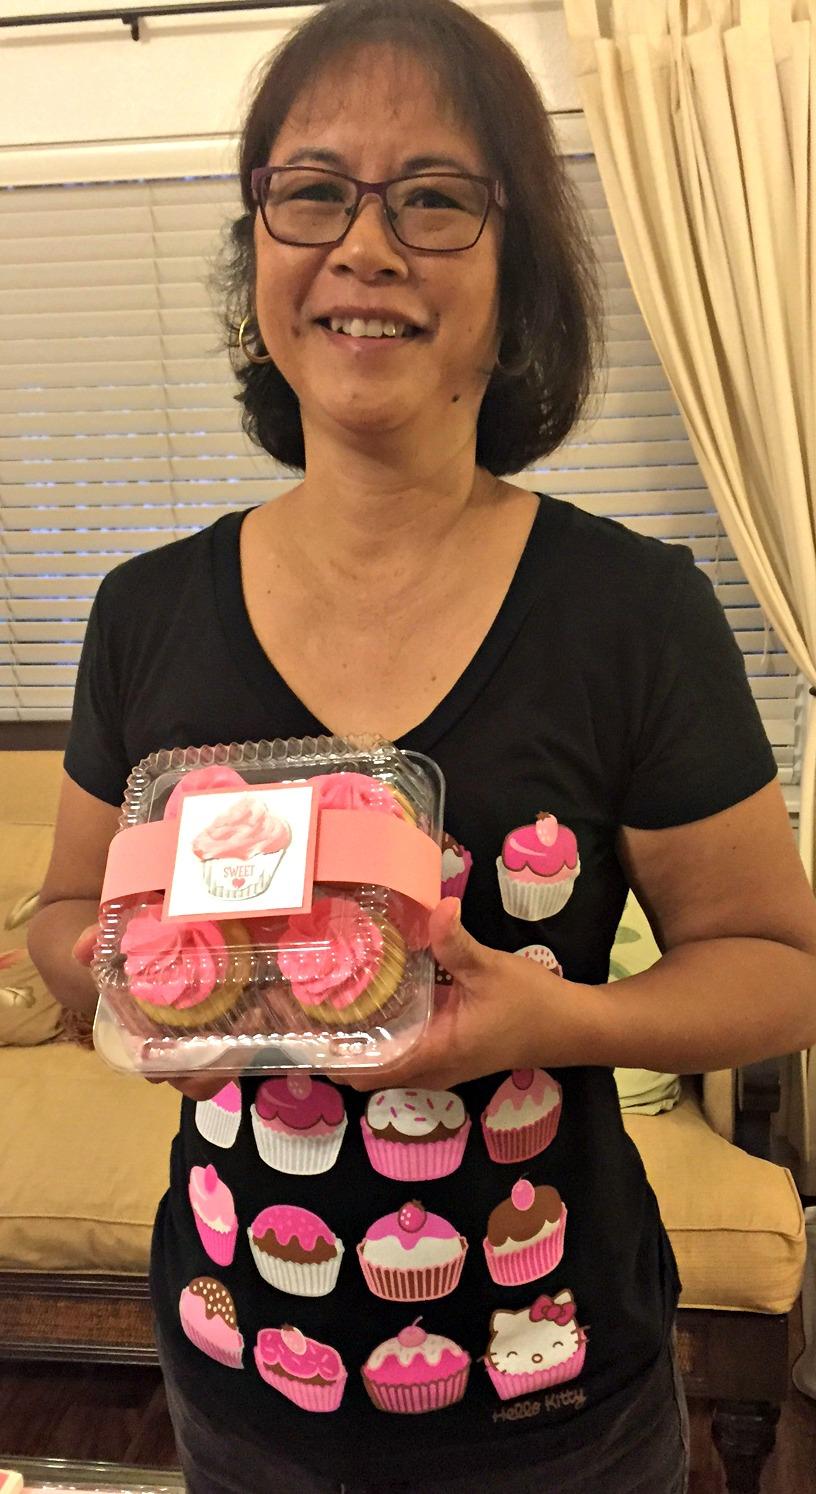 Cute as a Cupcake - www.stampedwithaloha.com